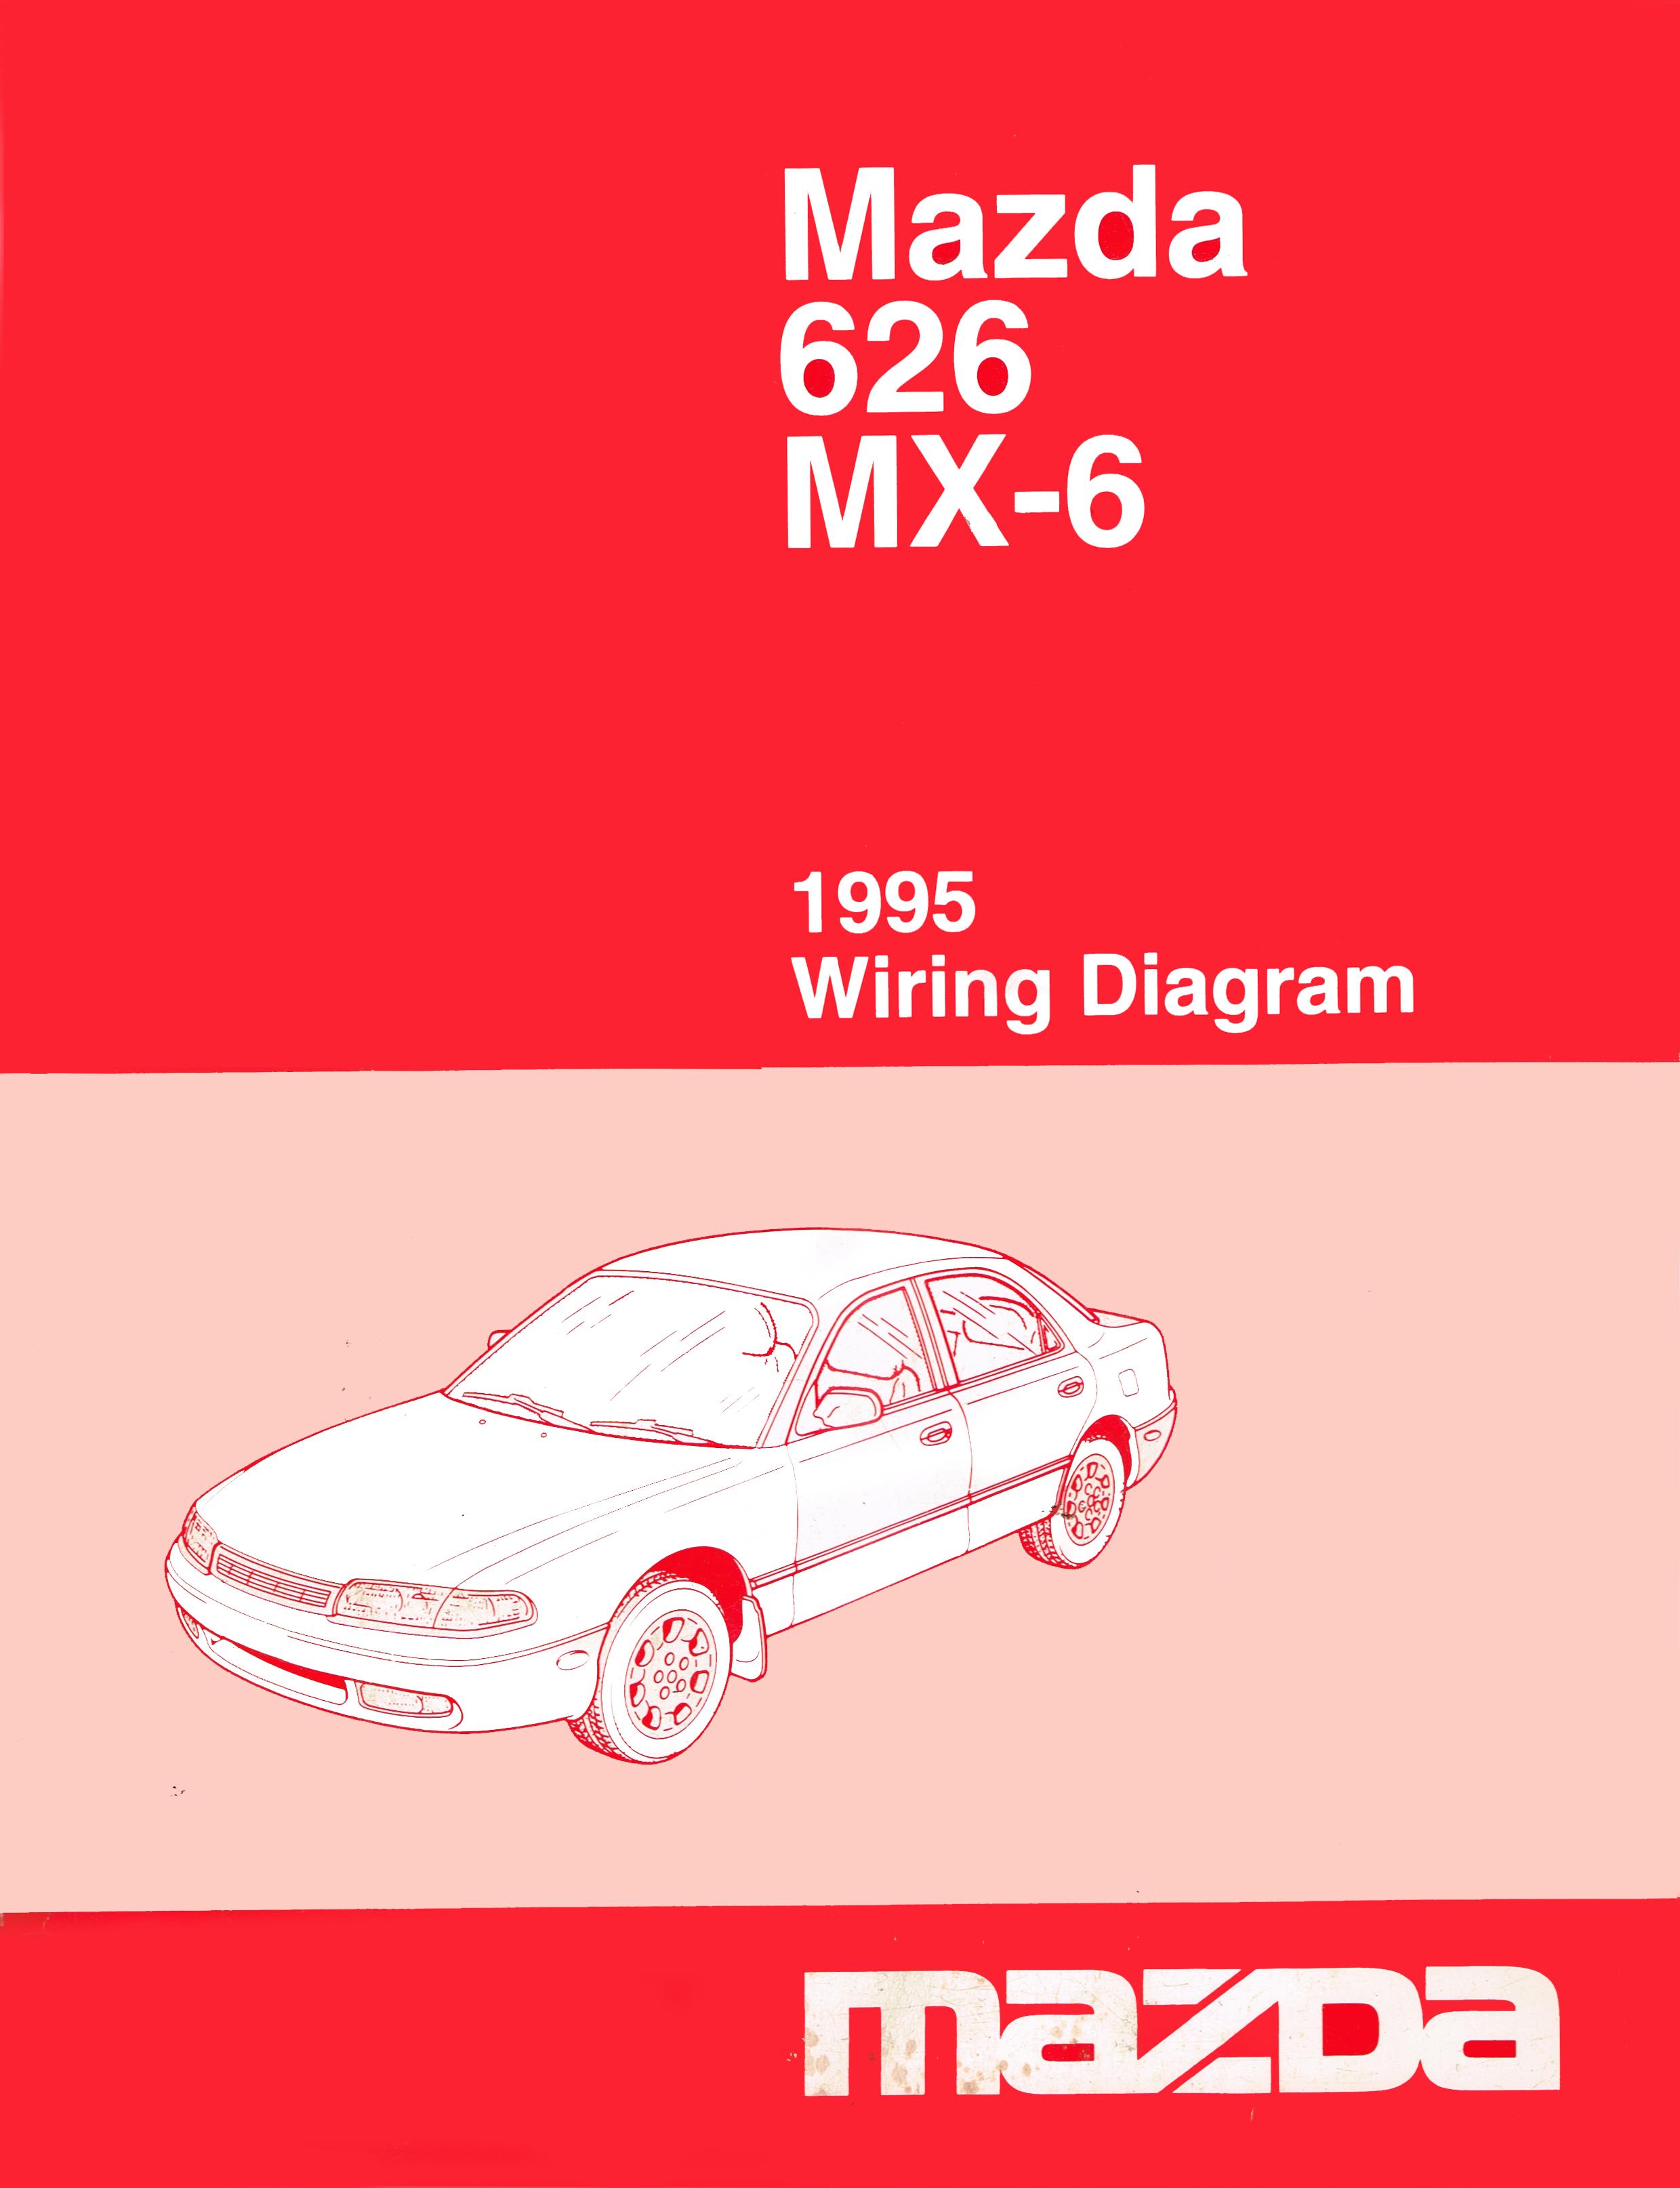 Pmx626fo usmazda 626 mx 6work shop manualsscans1995 00 coverg 1438kb aug 24 2014 054735 am asfbconference2016 Images